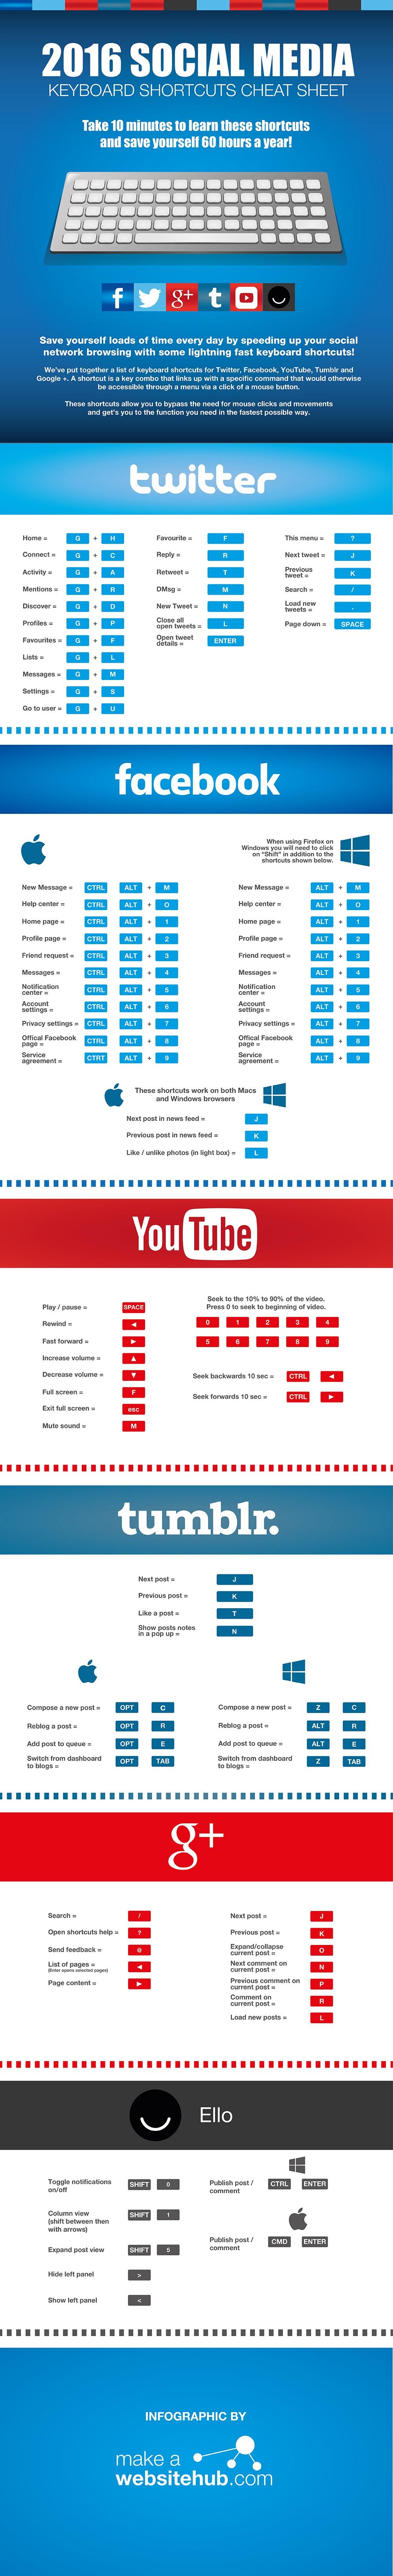 social-media-shortcuts-2016-infographic.jpg